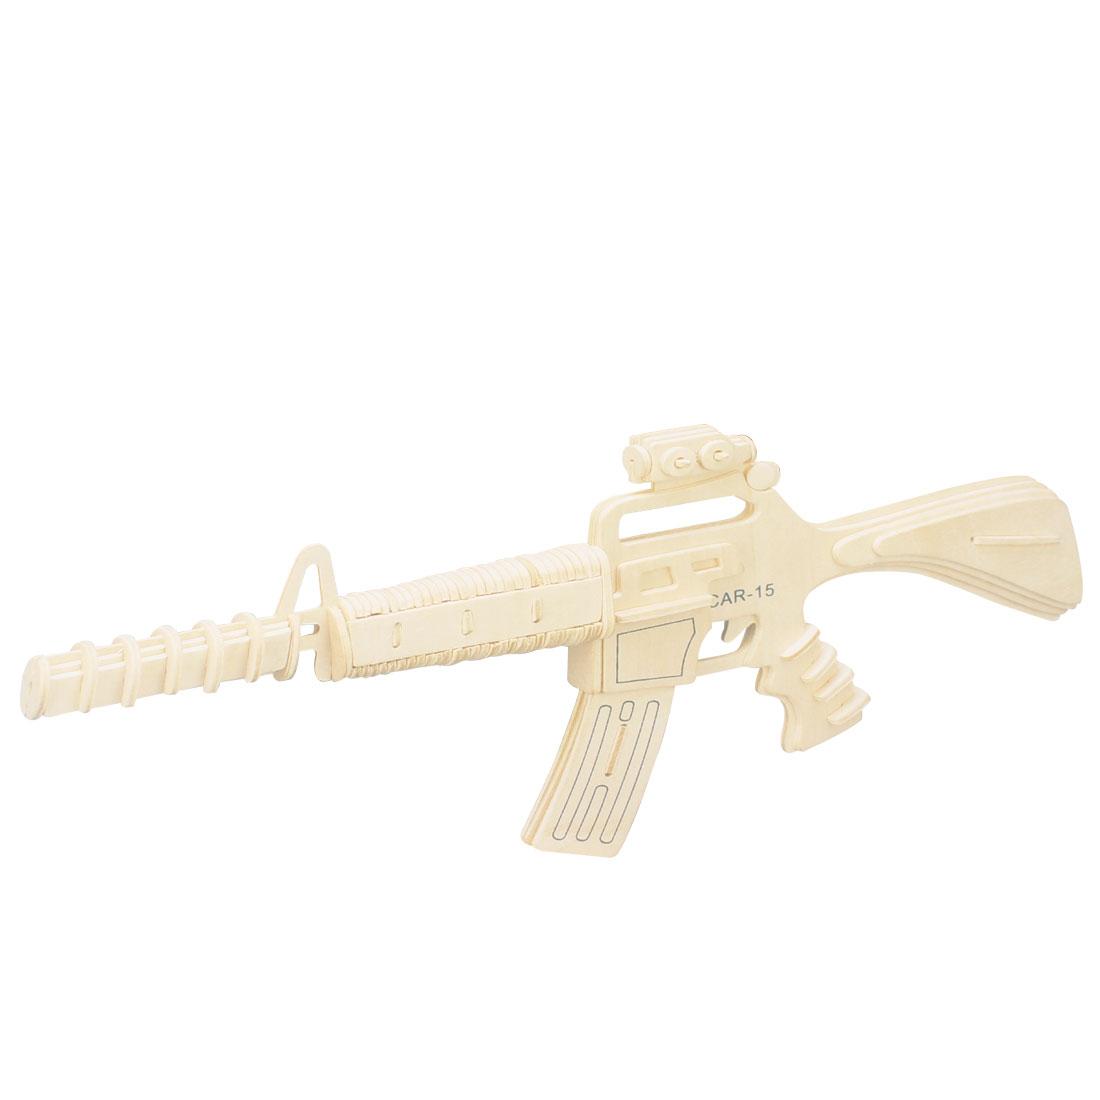 Children DIY Wooden Gun Model 3D Puzzle Toy Woodcraft Construction Kit